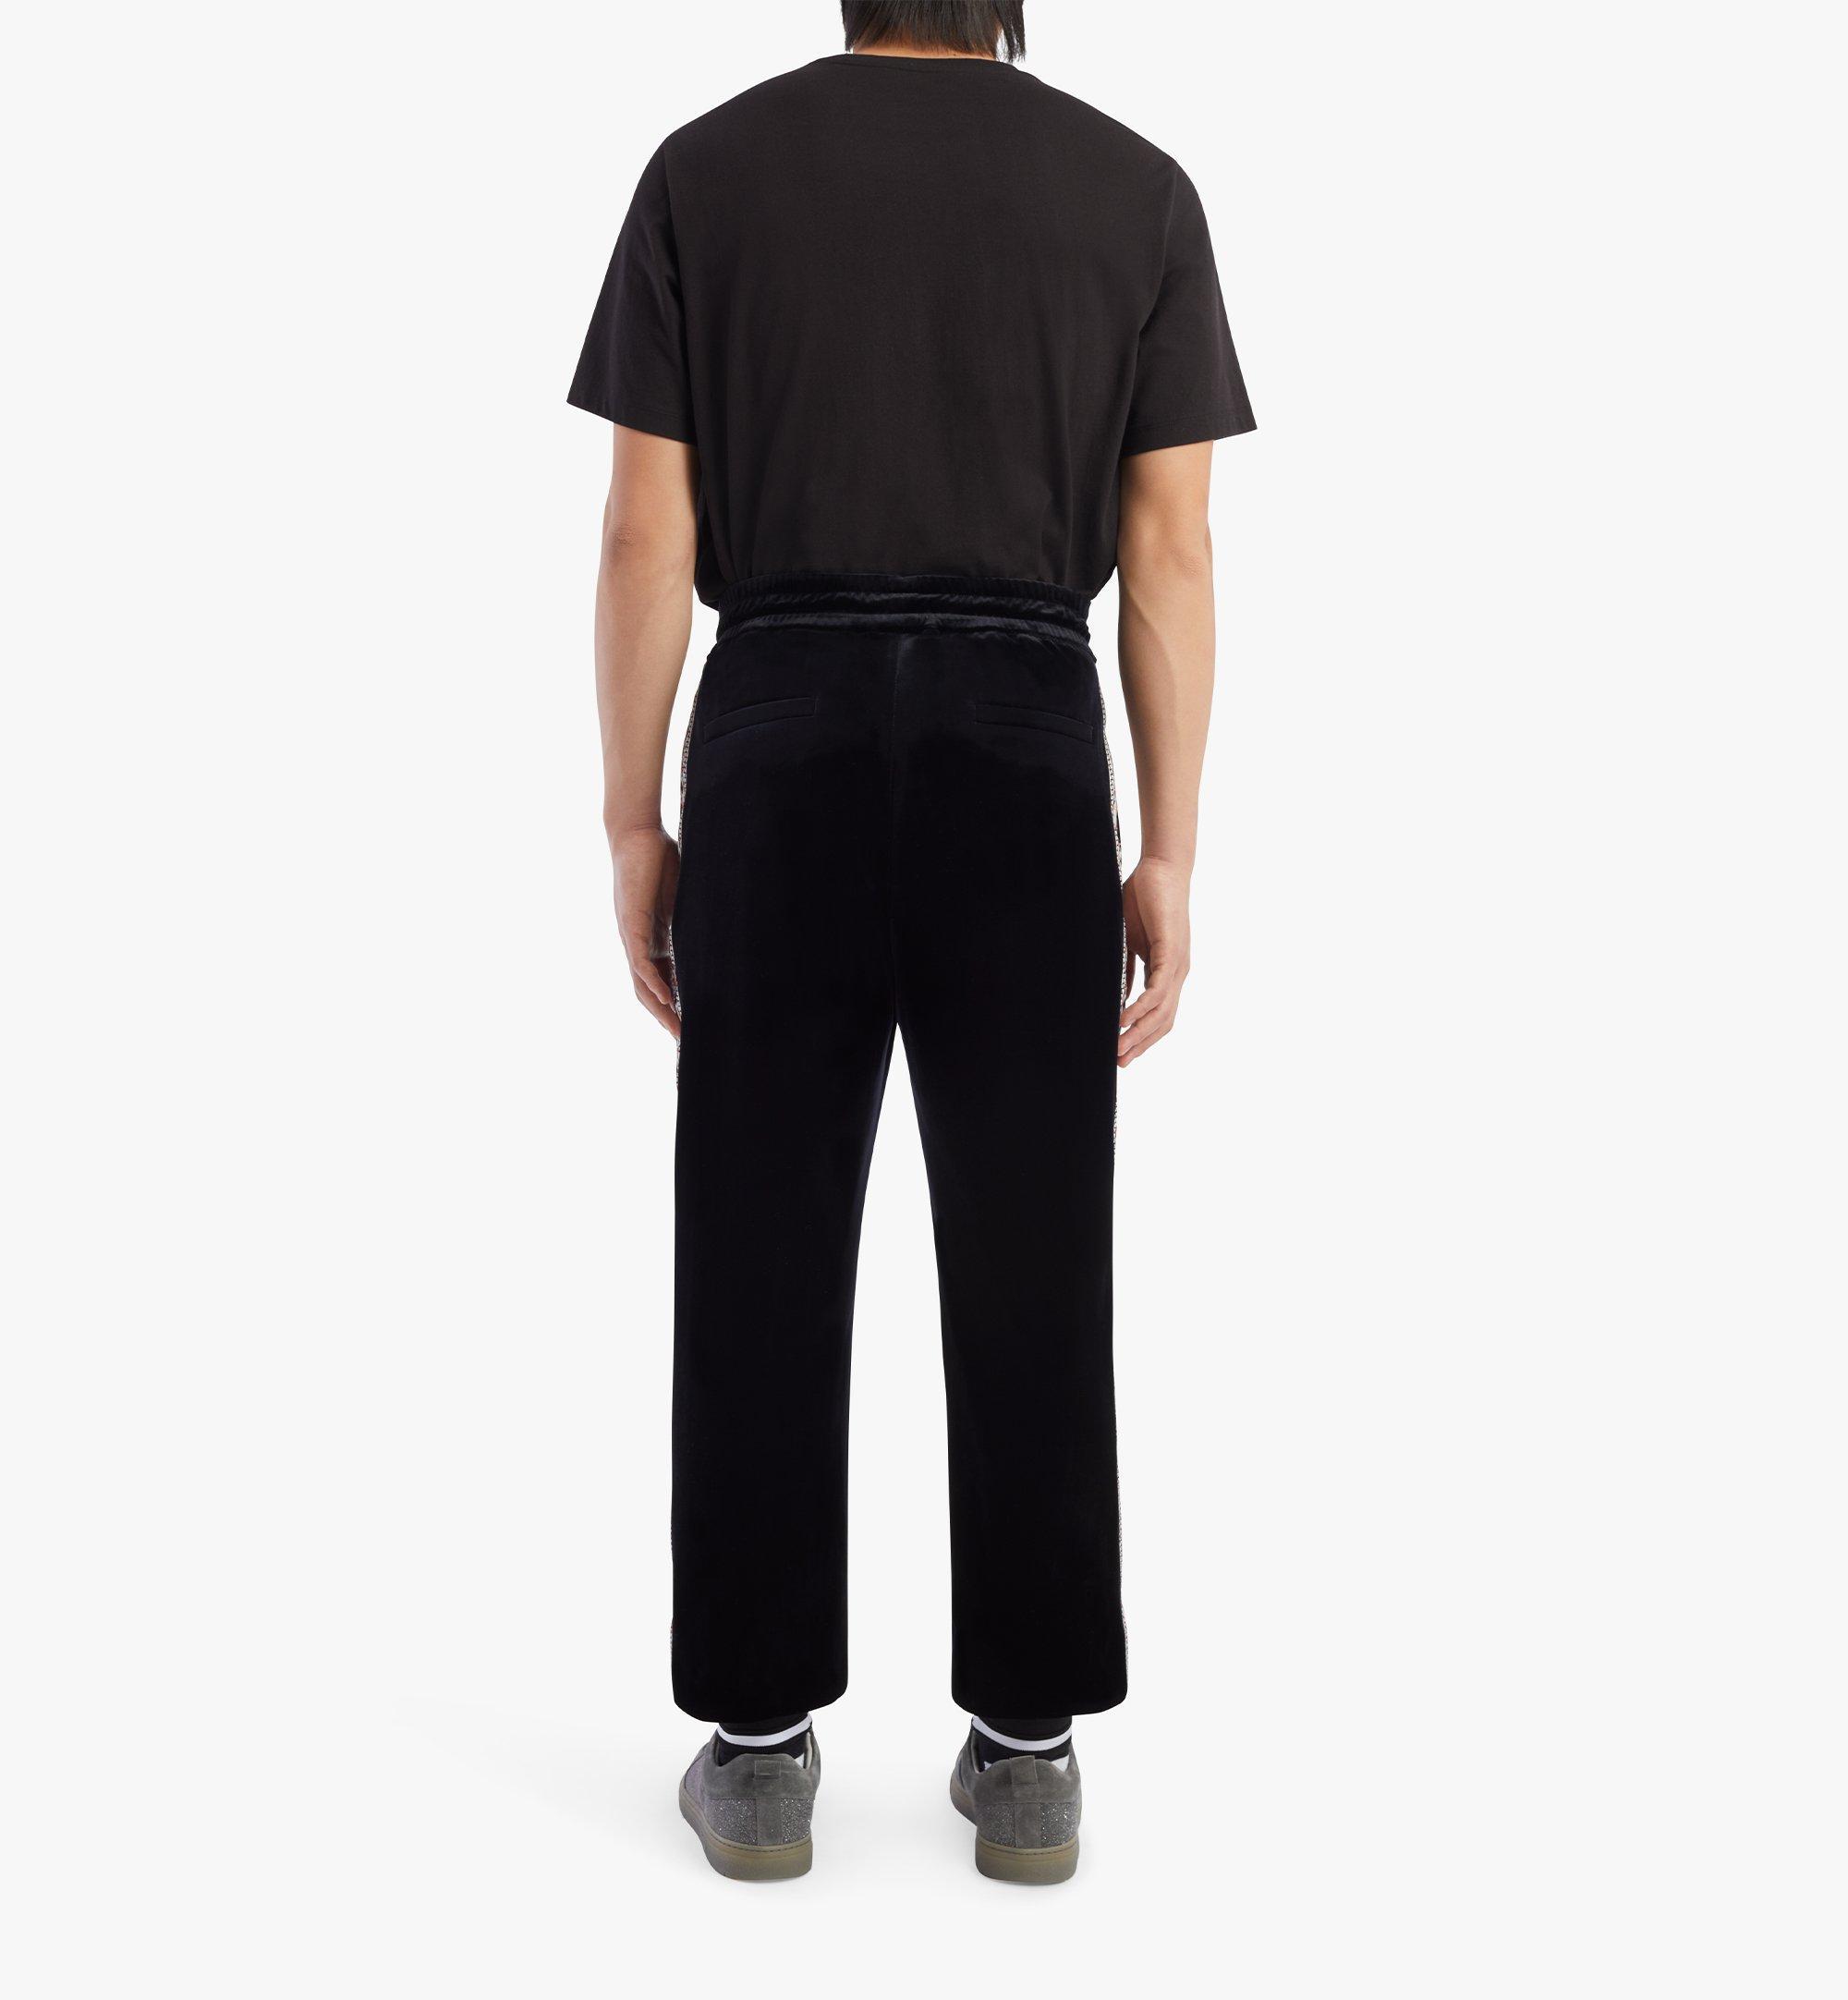 MCM Geo月桂叶丝绒运动裤 Black MHPBSMM04BK00M 更多视角 2